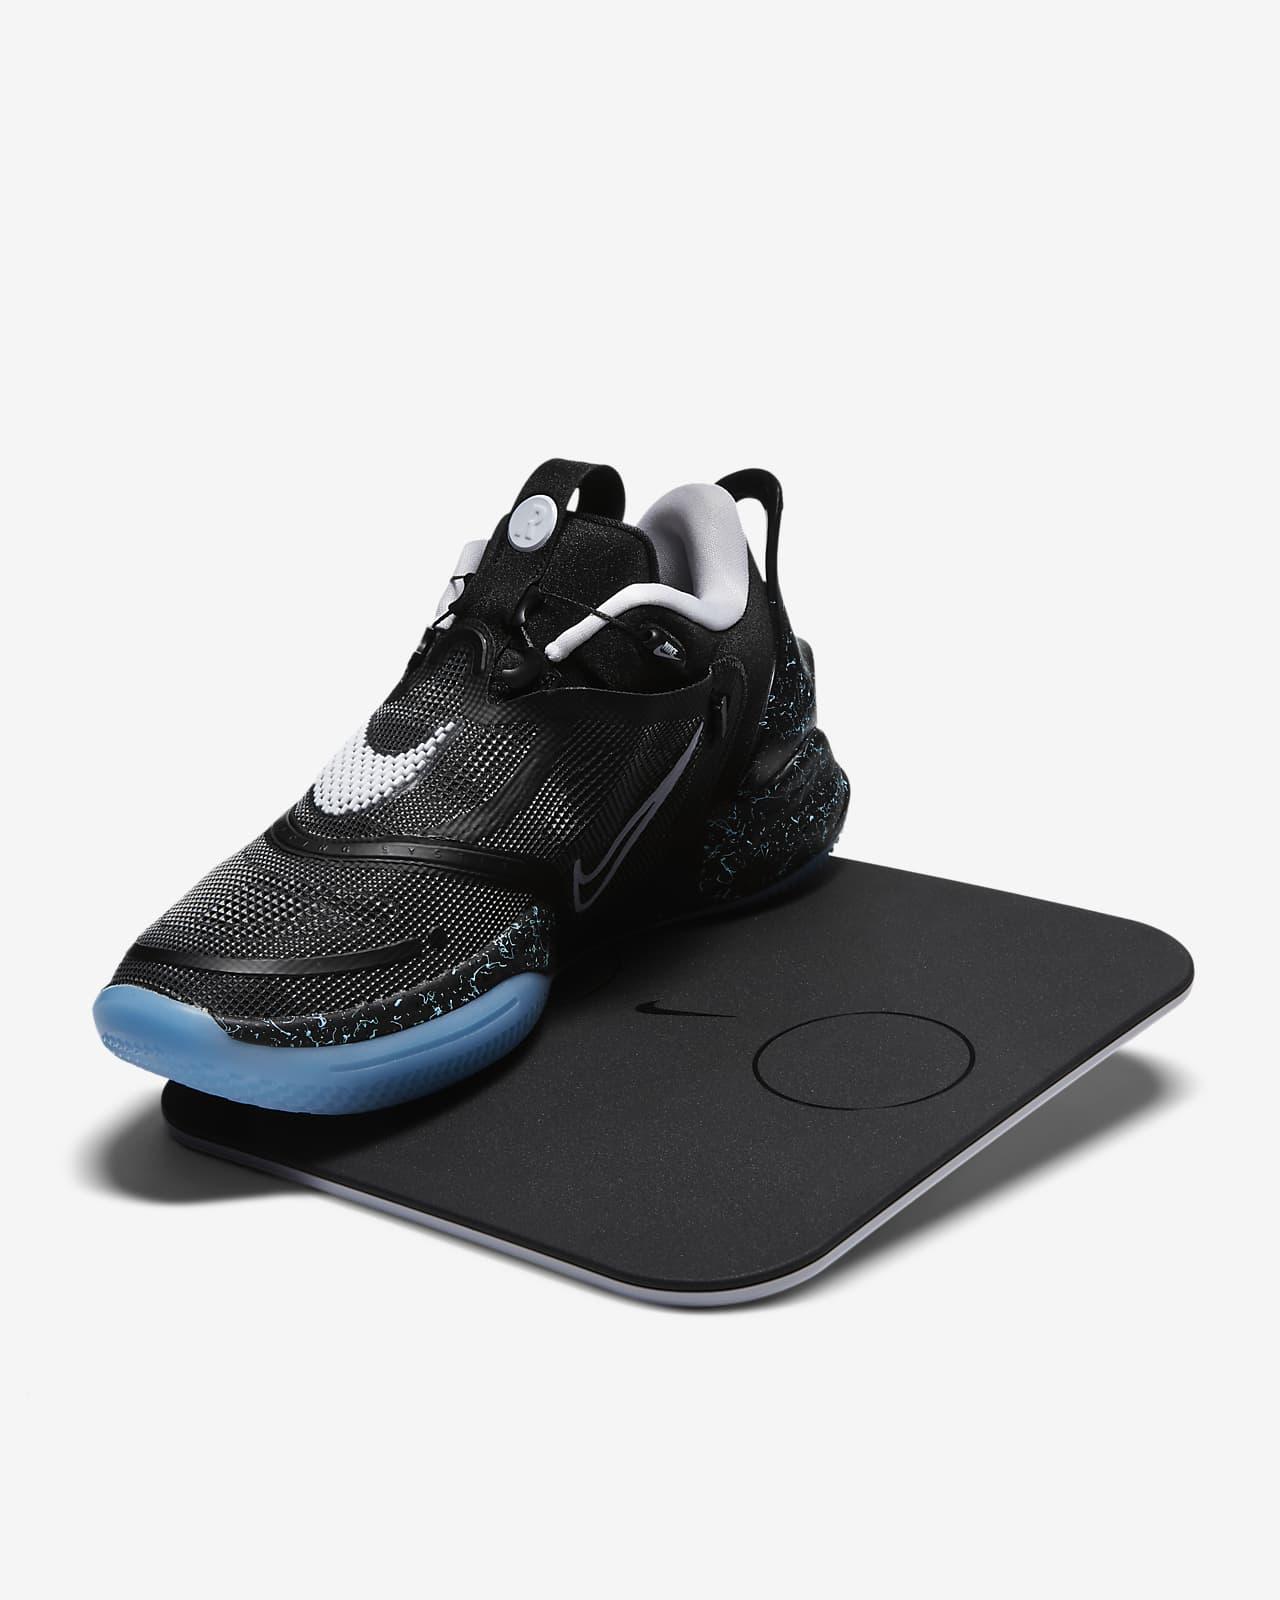 Nike Adapt BB 2.0 Basketball Shoe. Nike GB